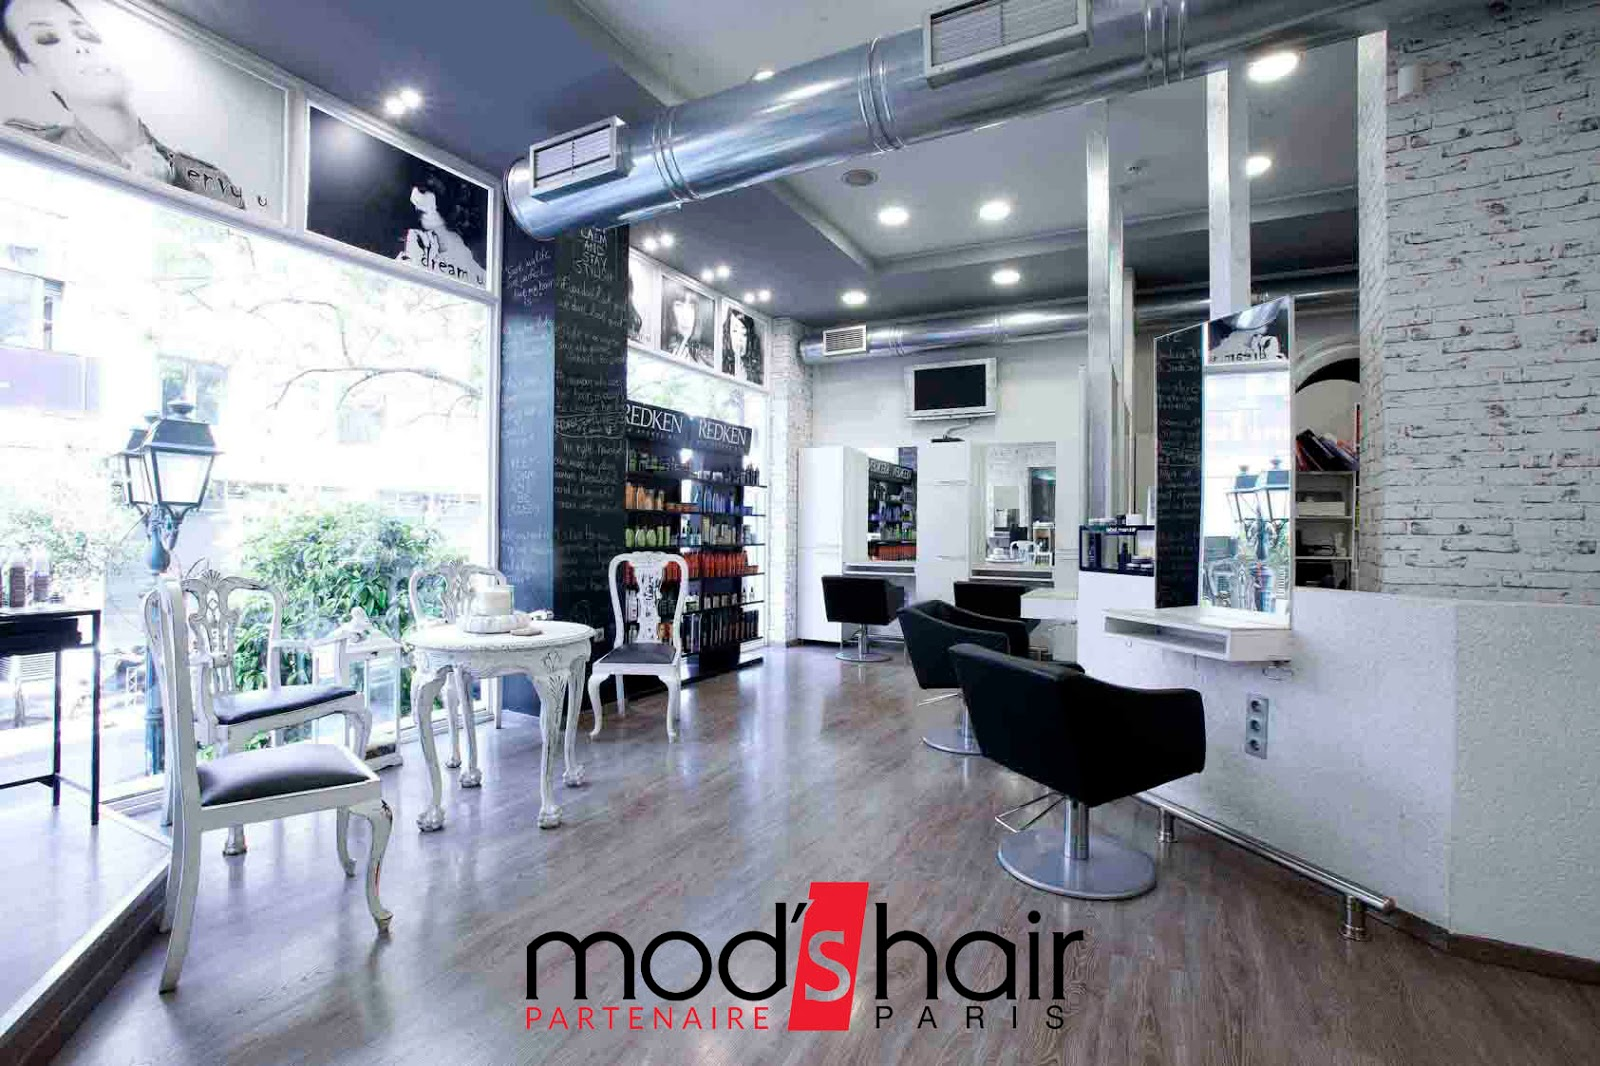 mod 39 s hair mod 39 s hair greece. Black Bedroom Furniture Sets. Home Design Ideas